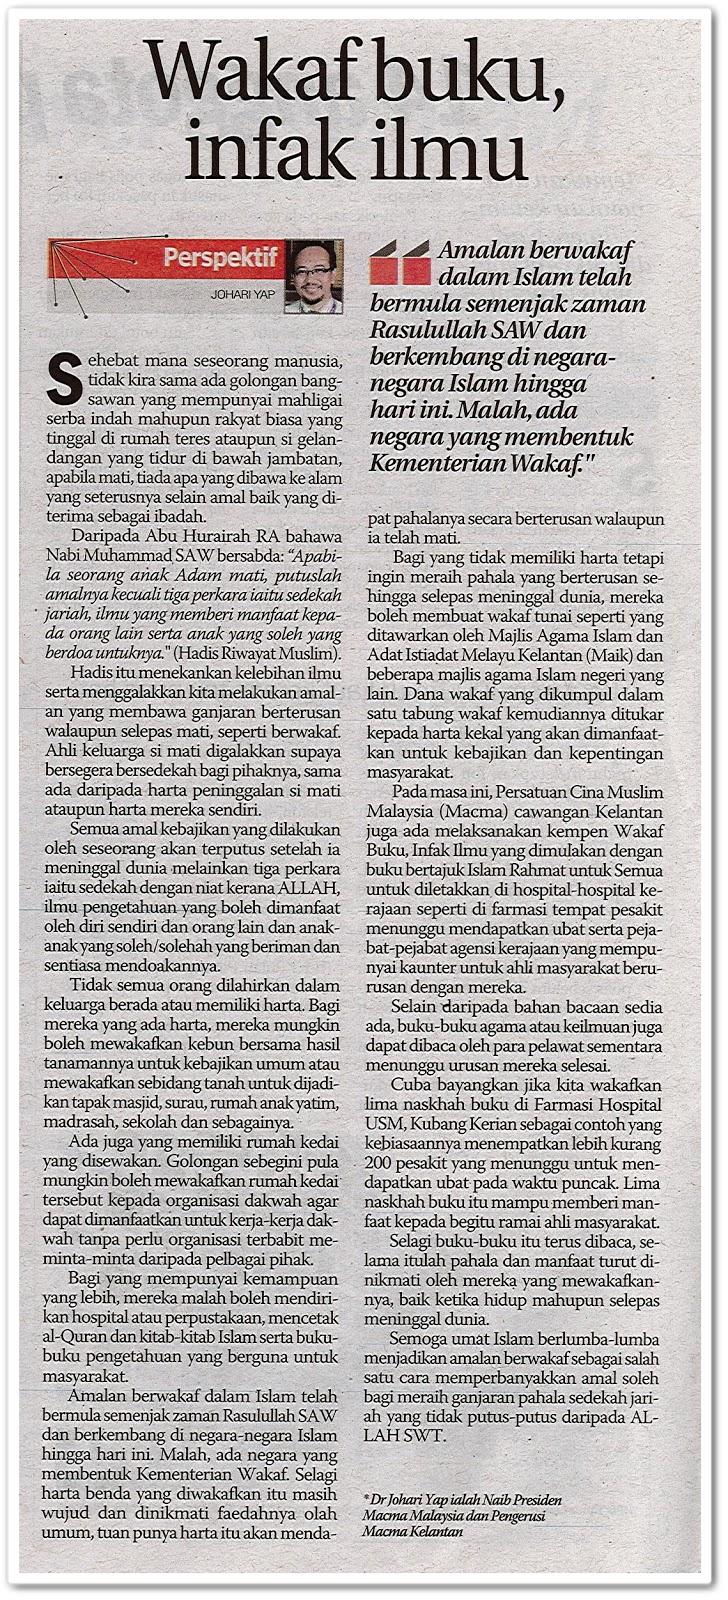 Wakaf buku, infak ilmu - Keratan akhbar Sinar Harian 3 November 2019